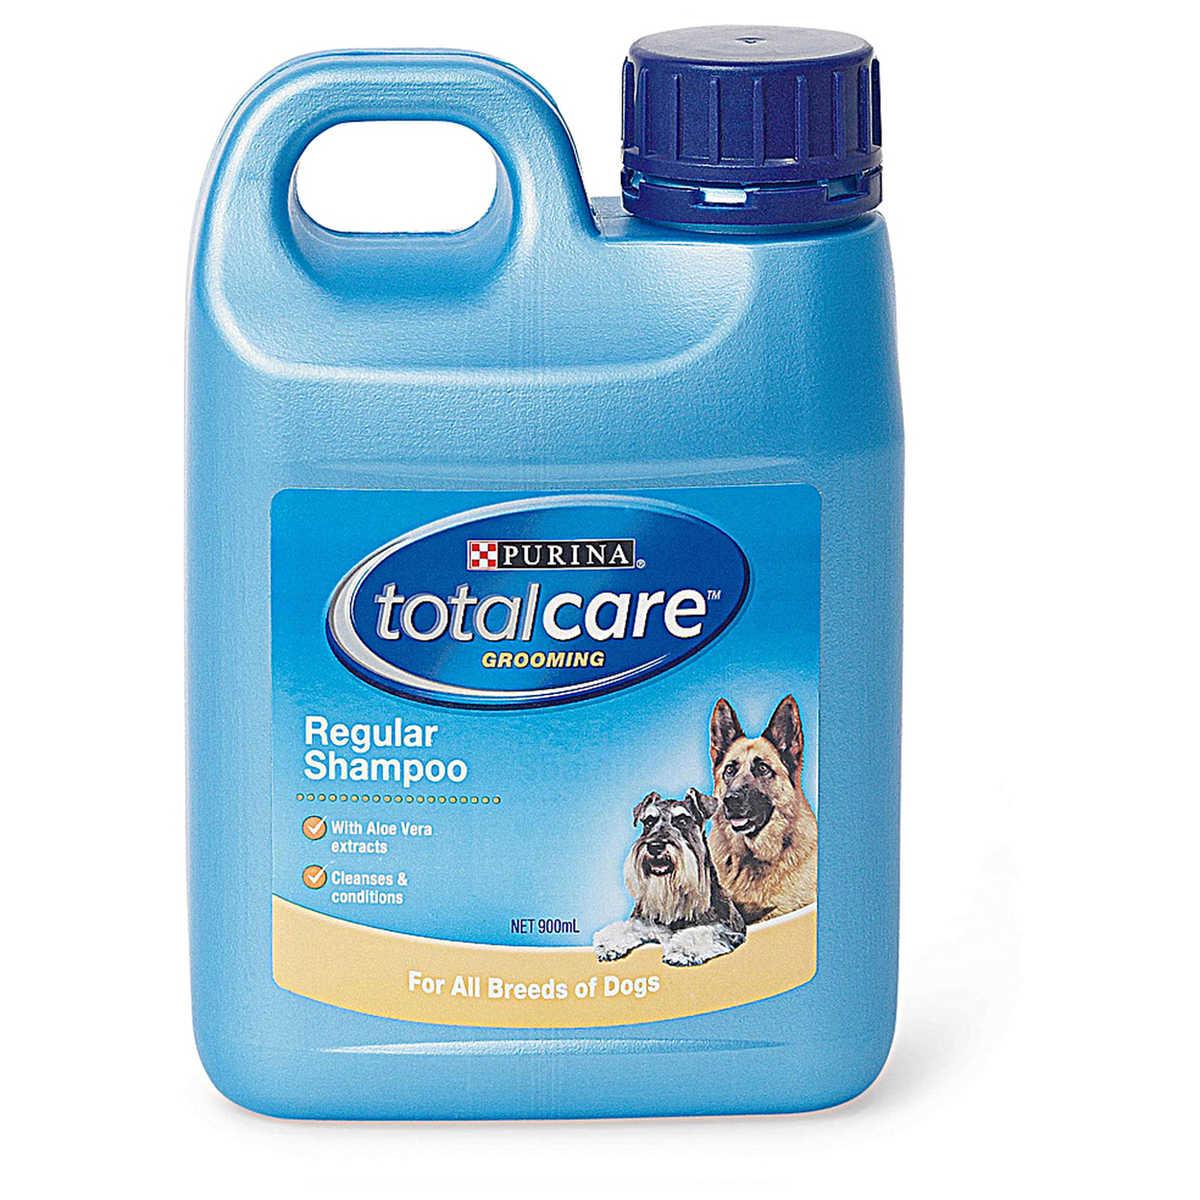 Purina Dog Shampoo Review